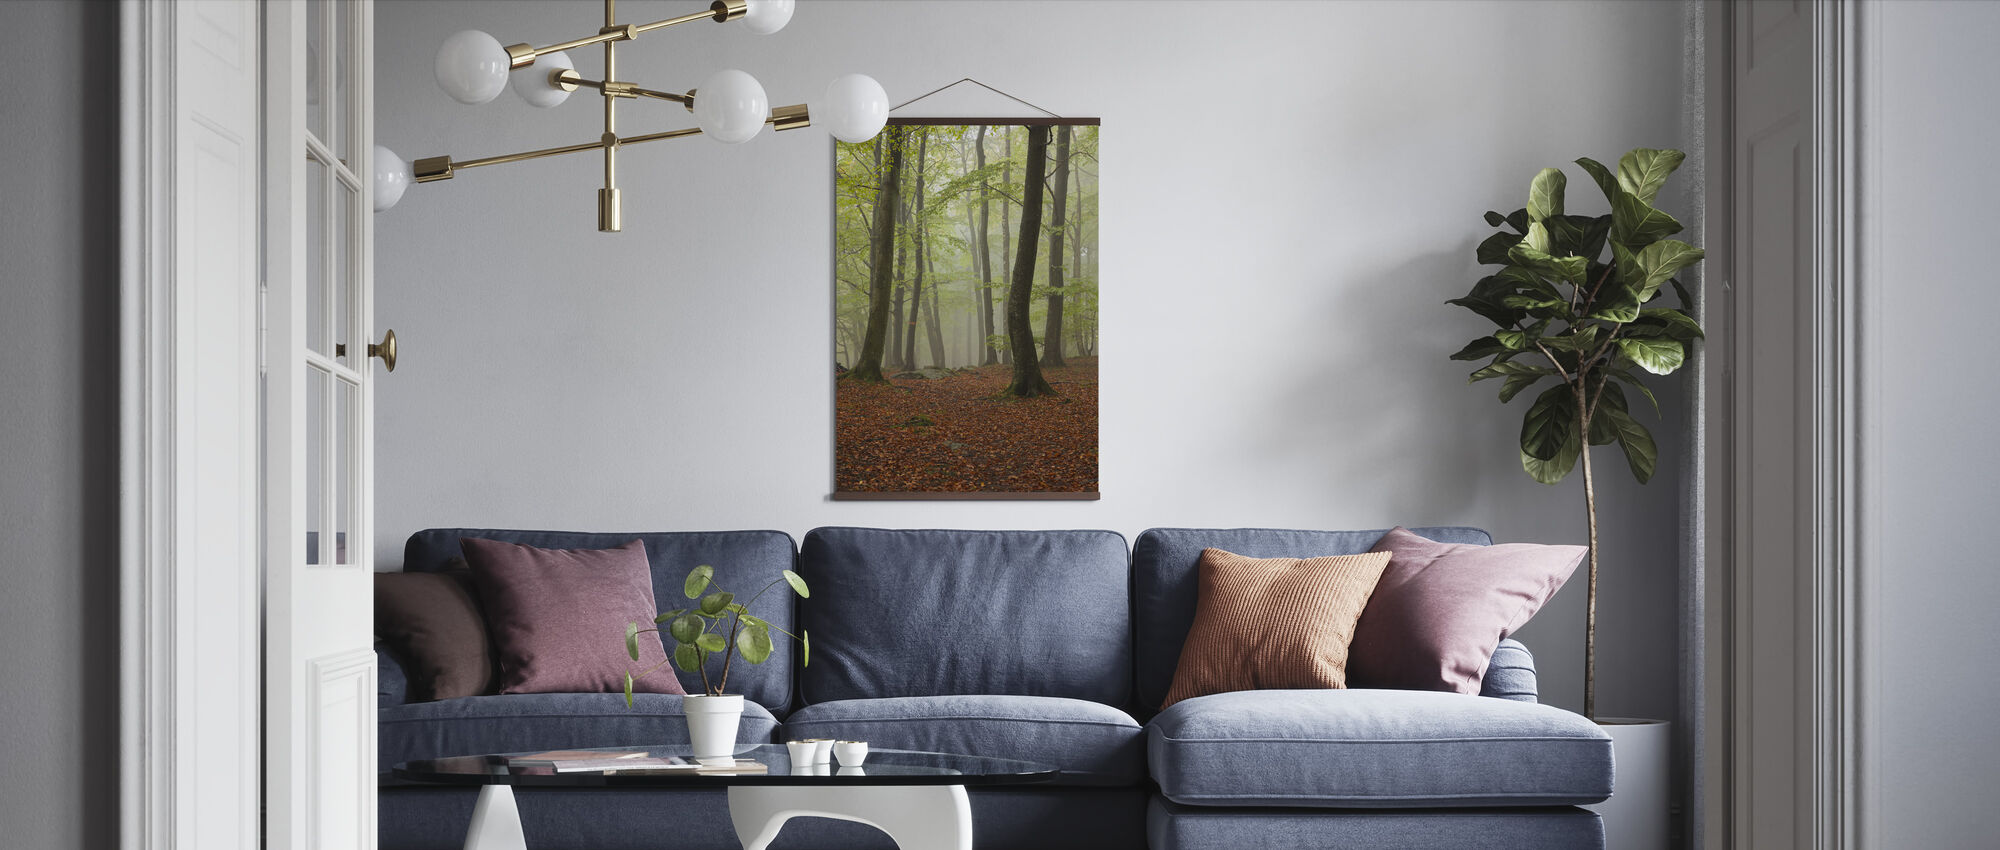 Clowing Hallar Beuken Forest, Zweden, Europa - Poster - Woonkamer